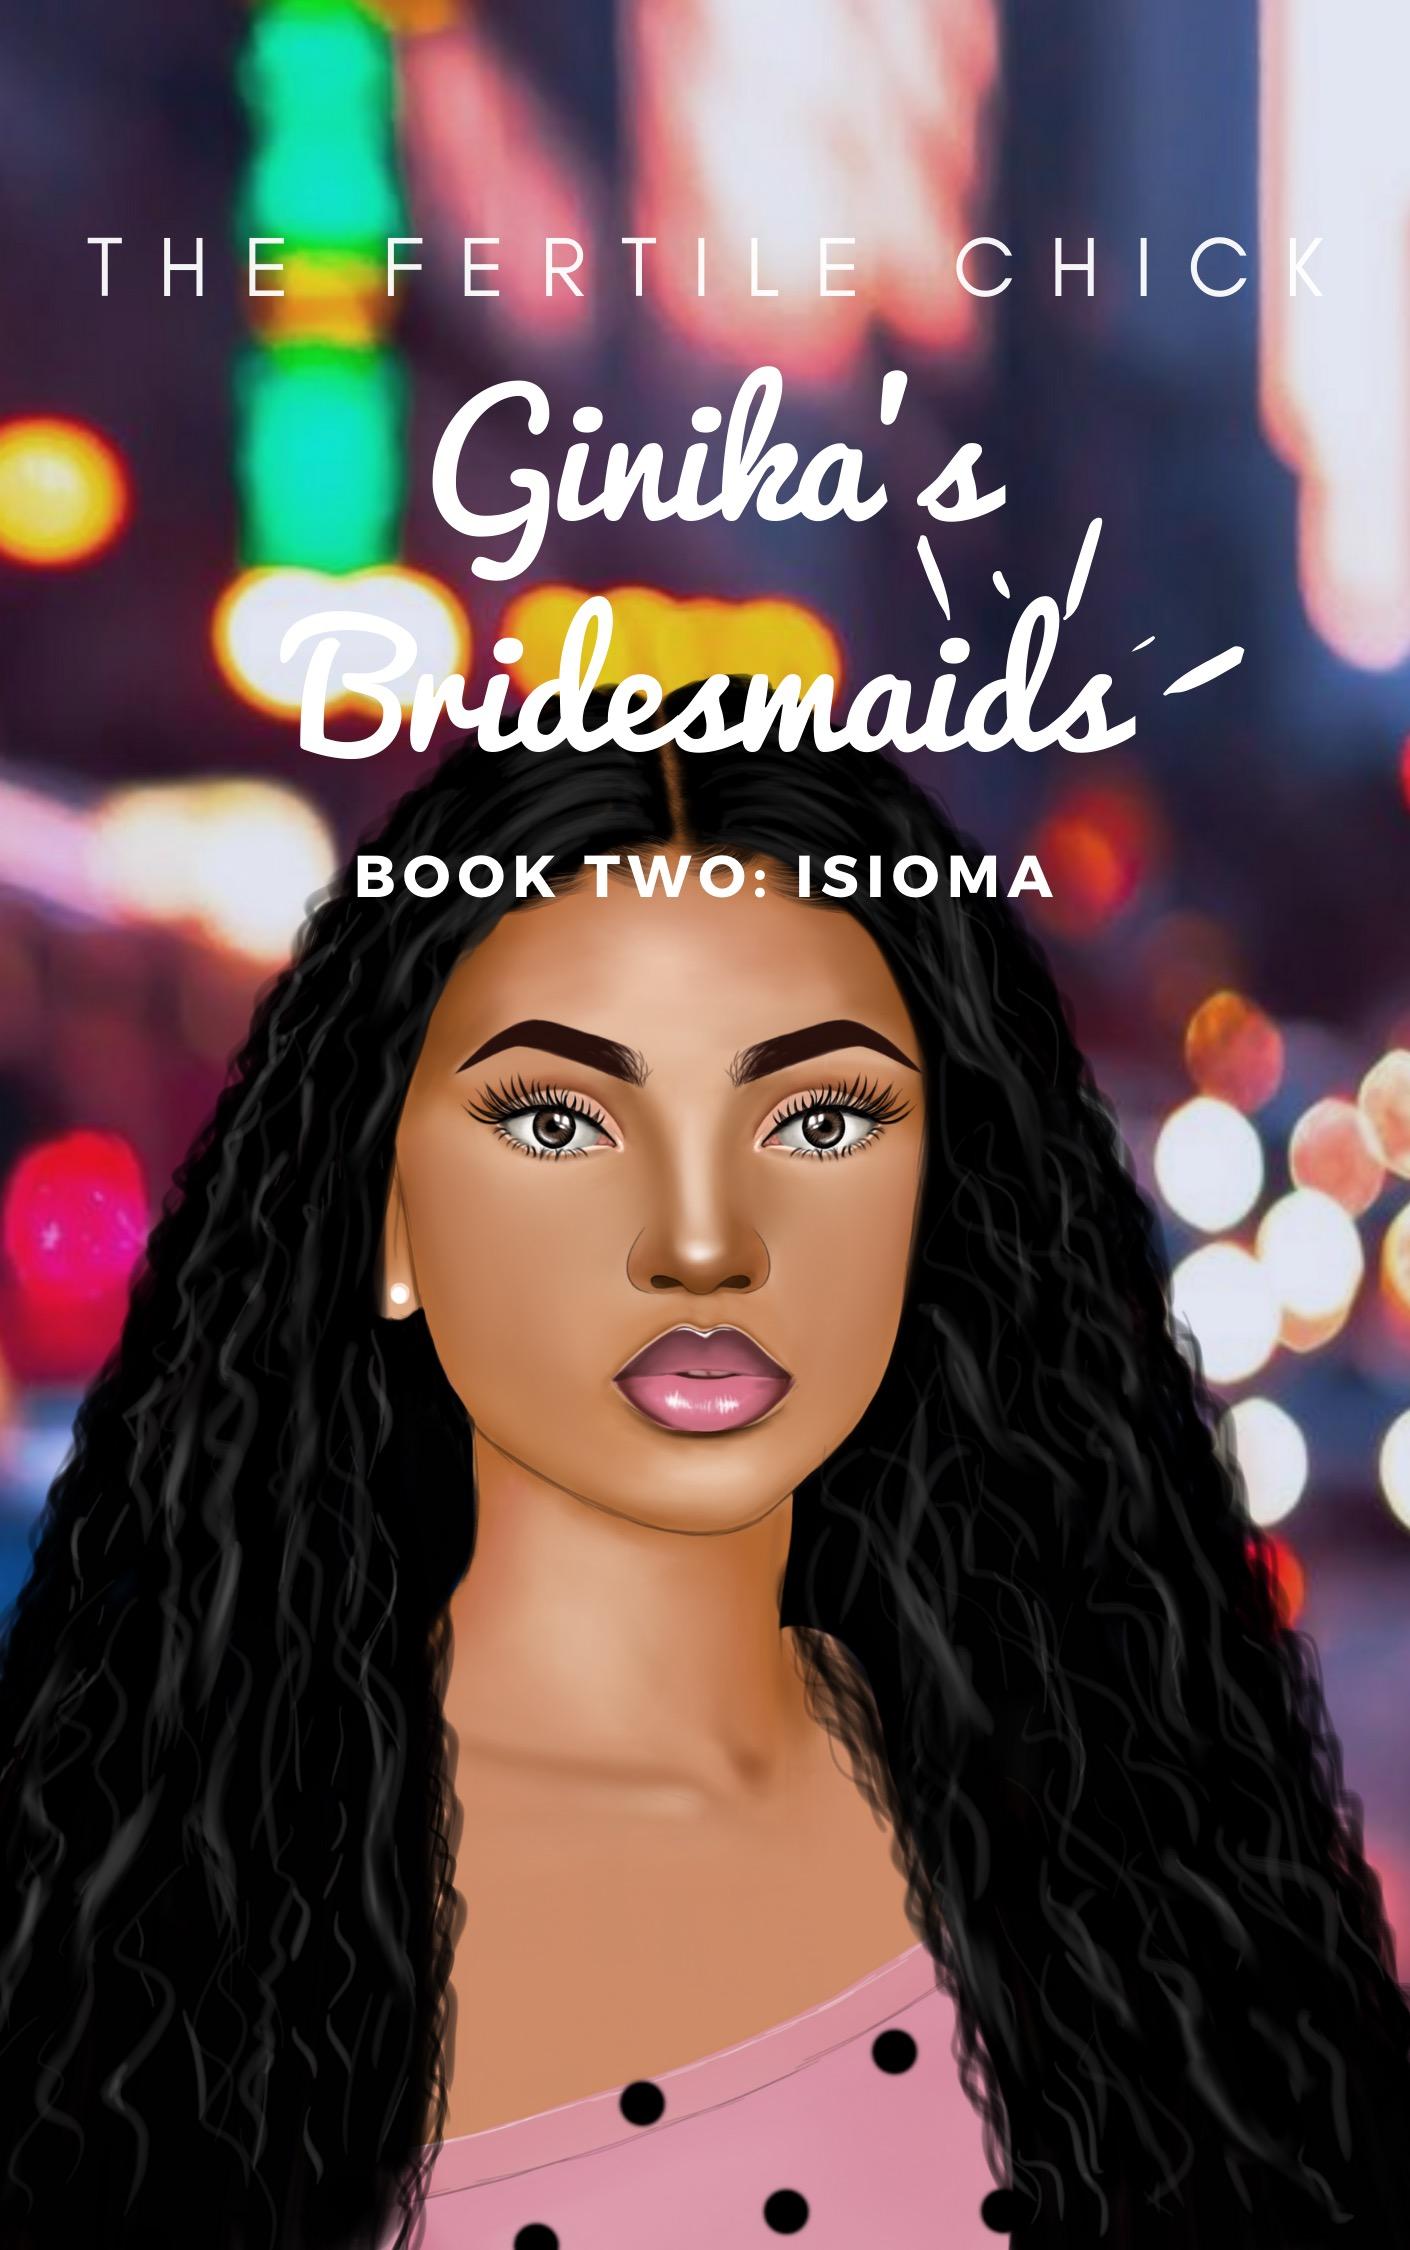 Ginika's Bridesmaids: Book Two (Isioma)